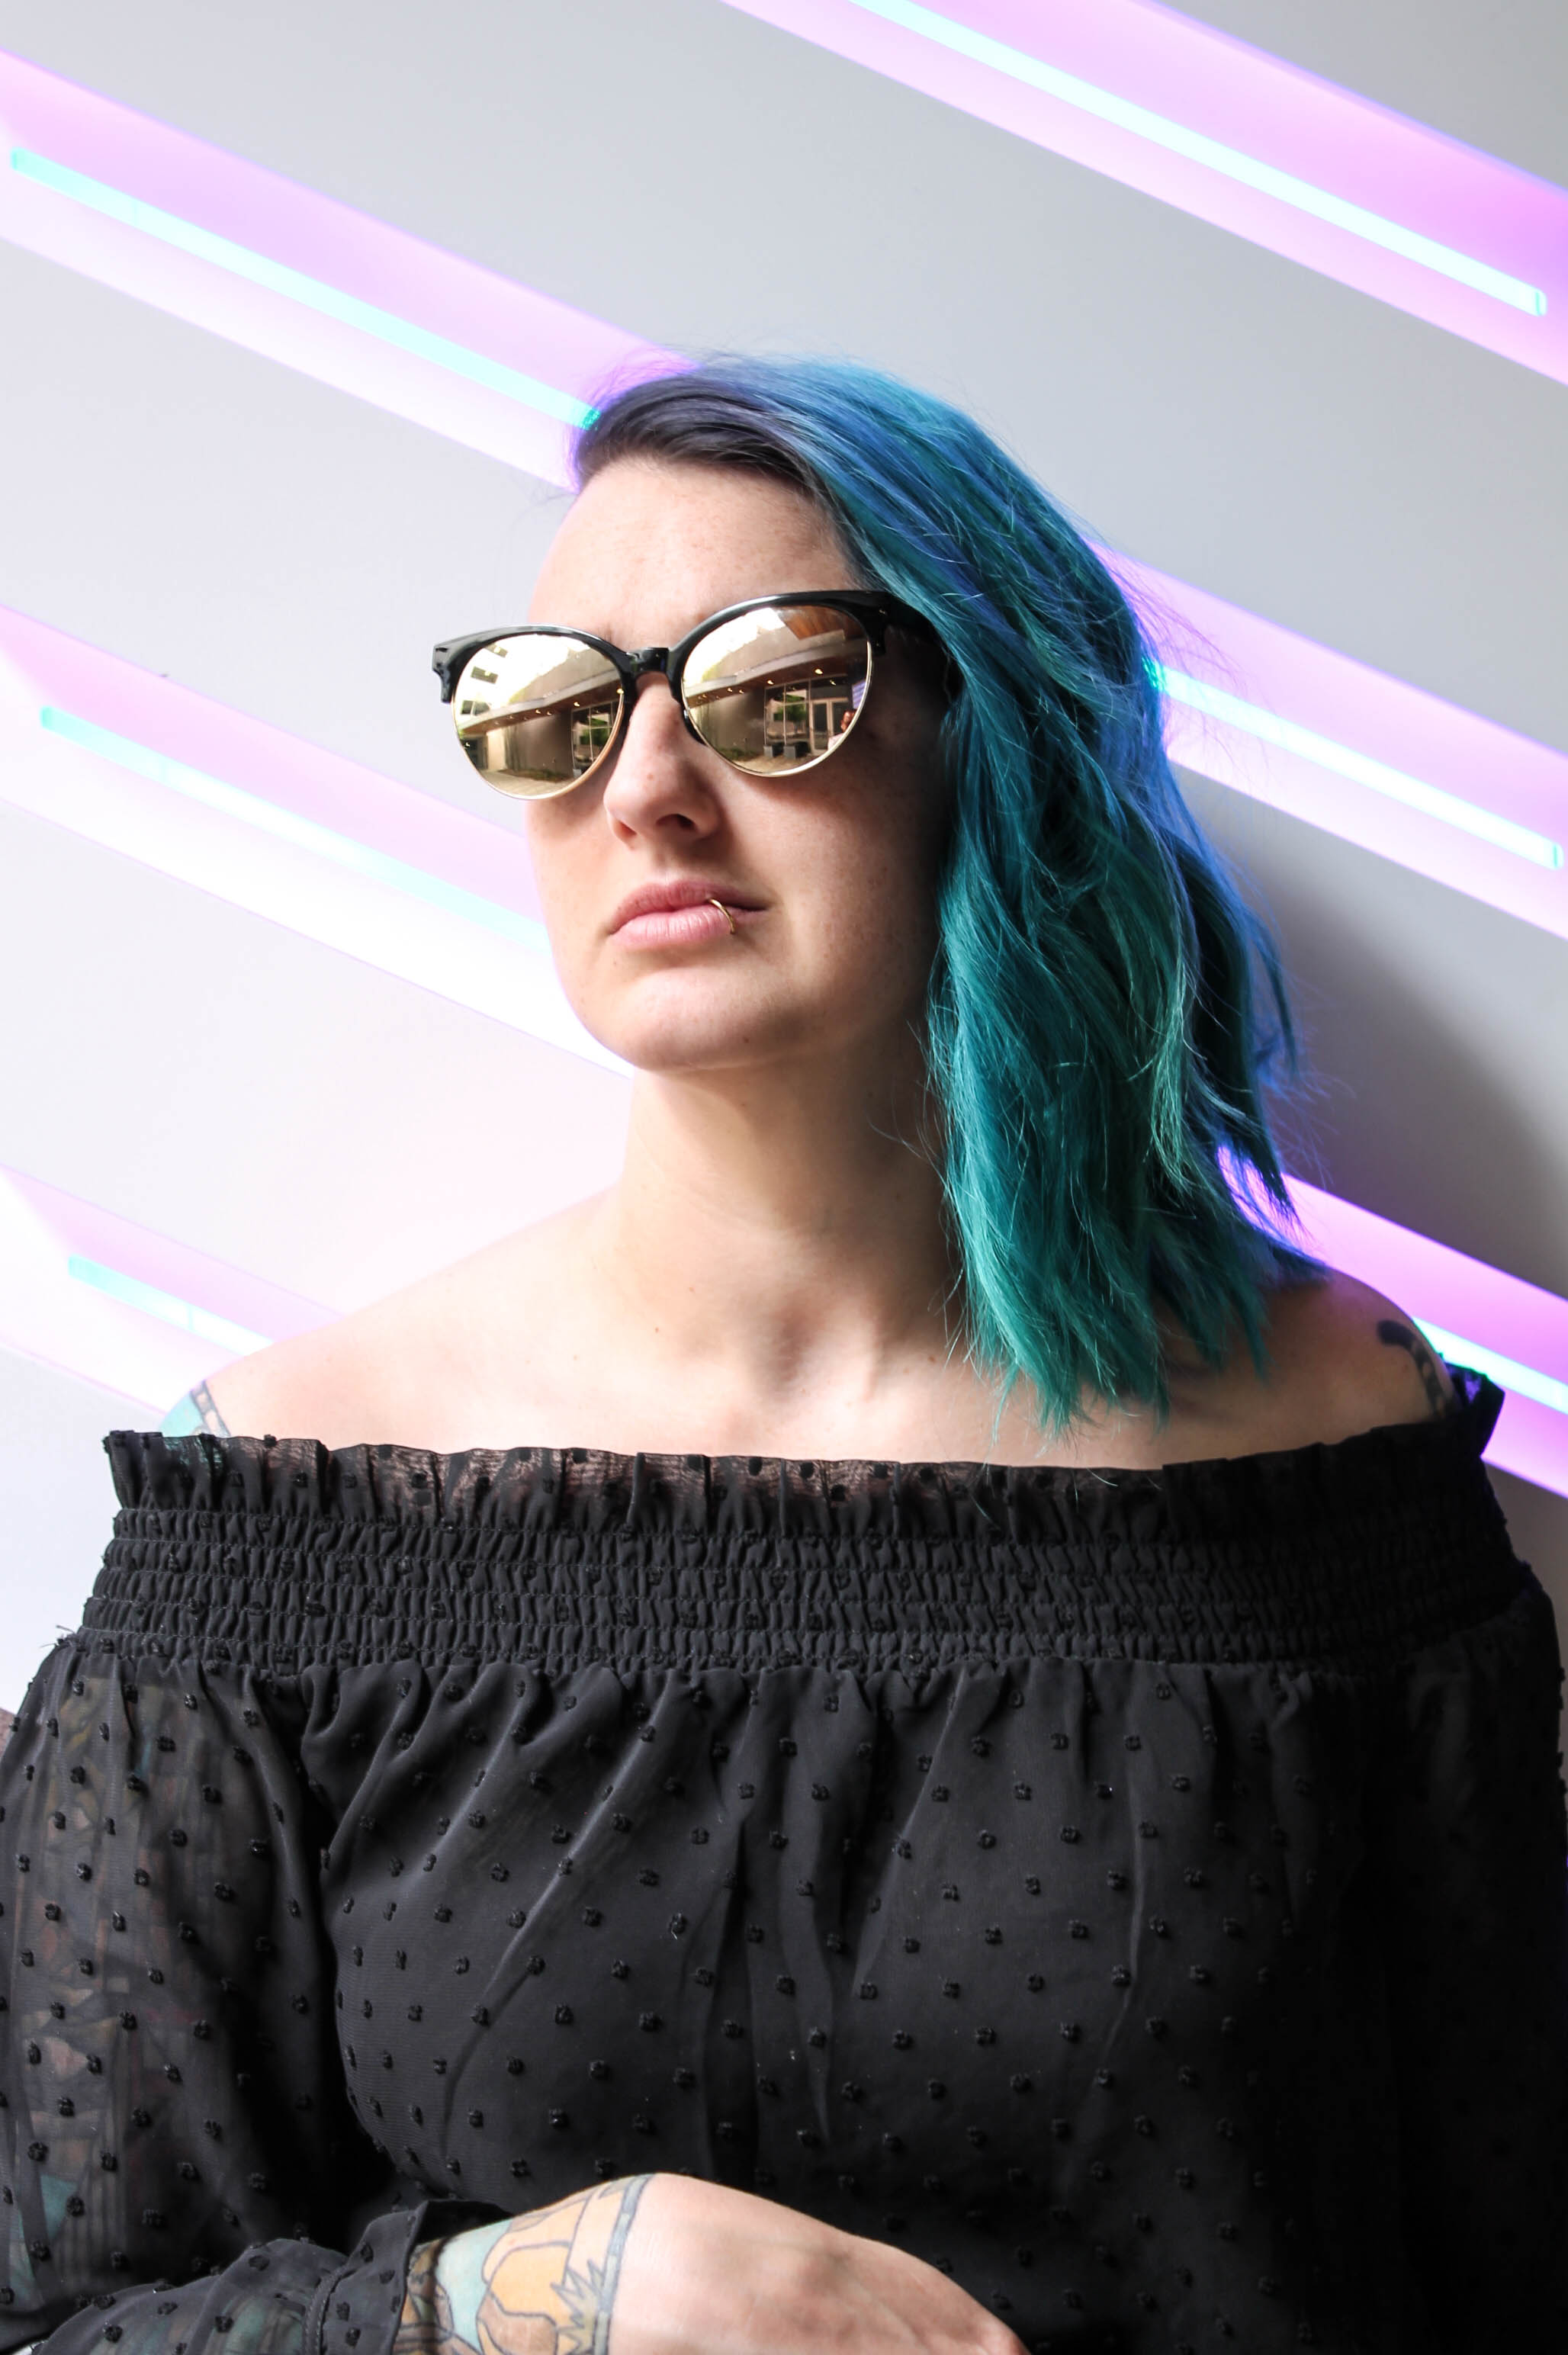 blue hair black sunglasses